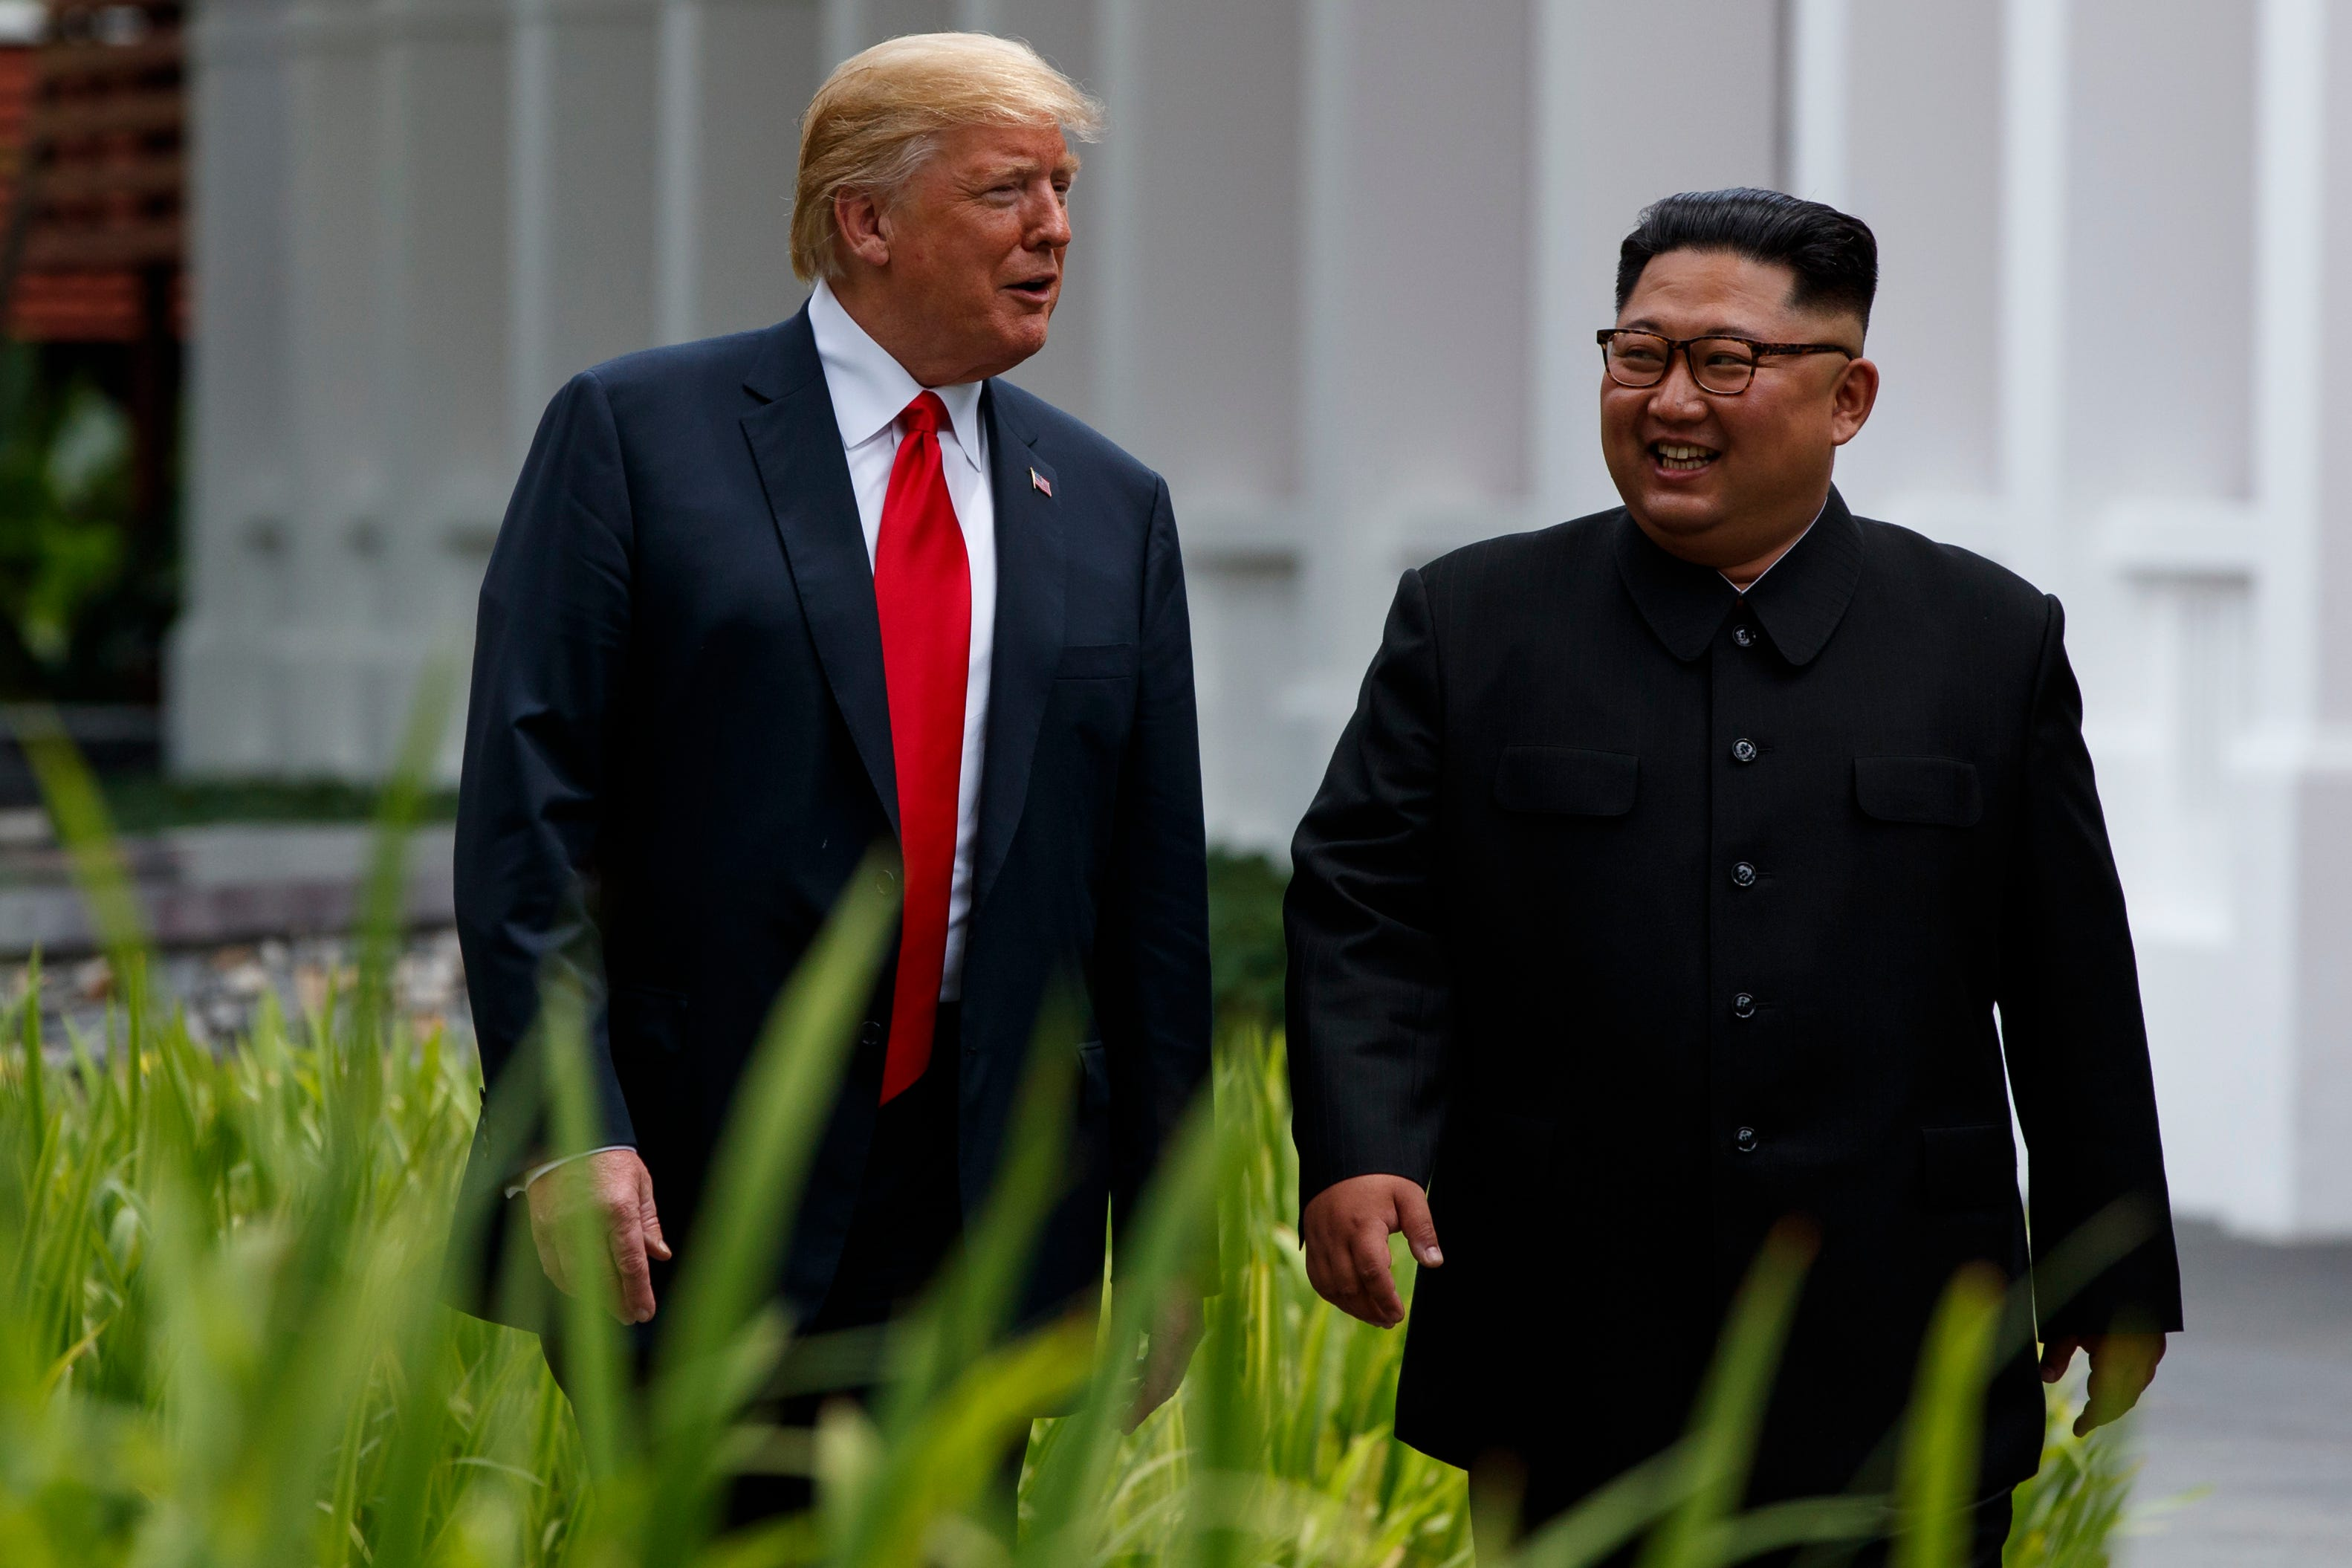 Donald Trump to meet Kim Jong Un in DMZ; may step onto North Korean soil